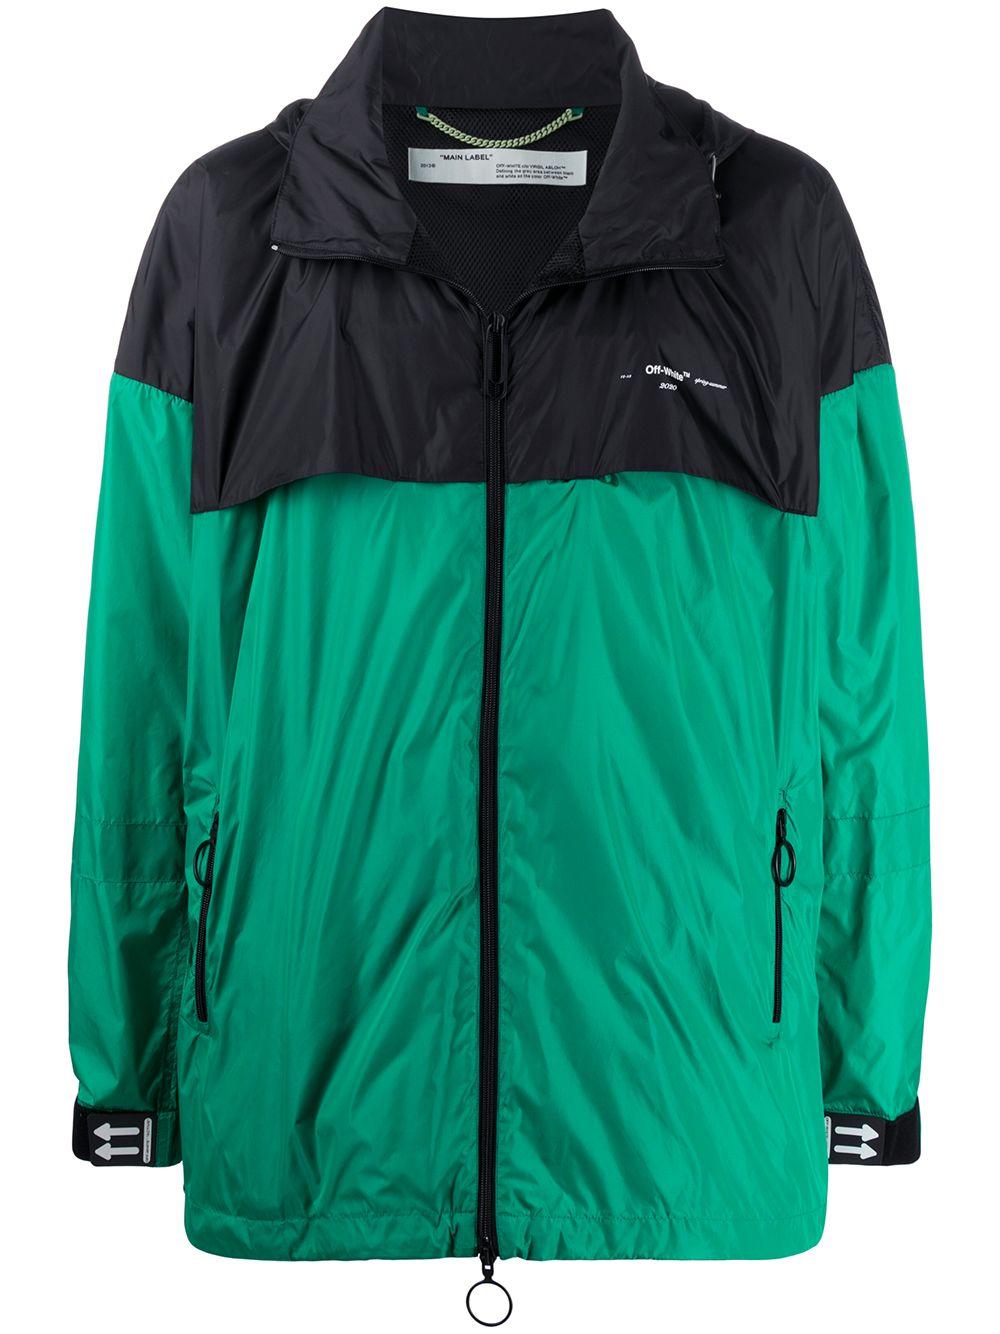 Windbraker Jacket